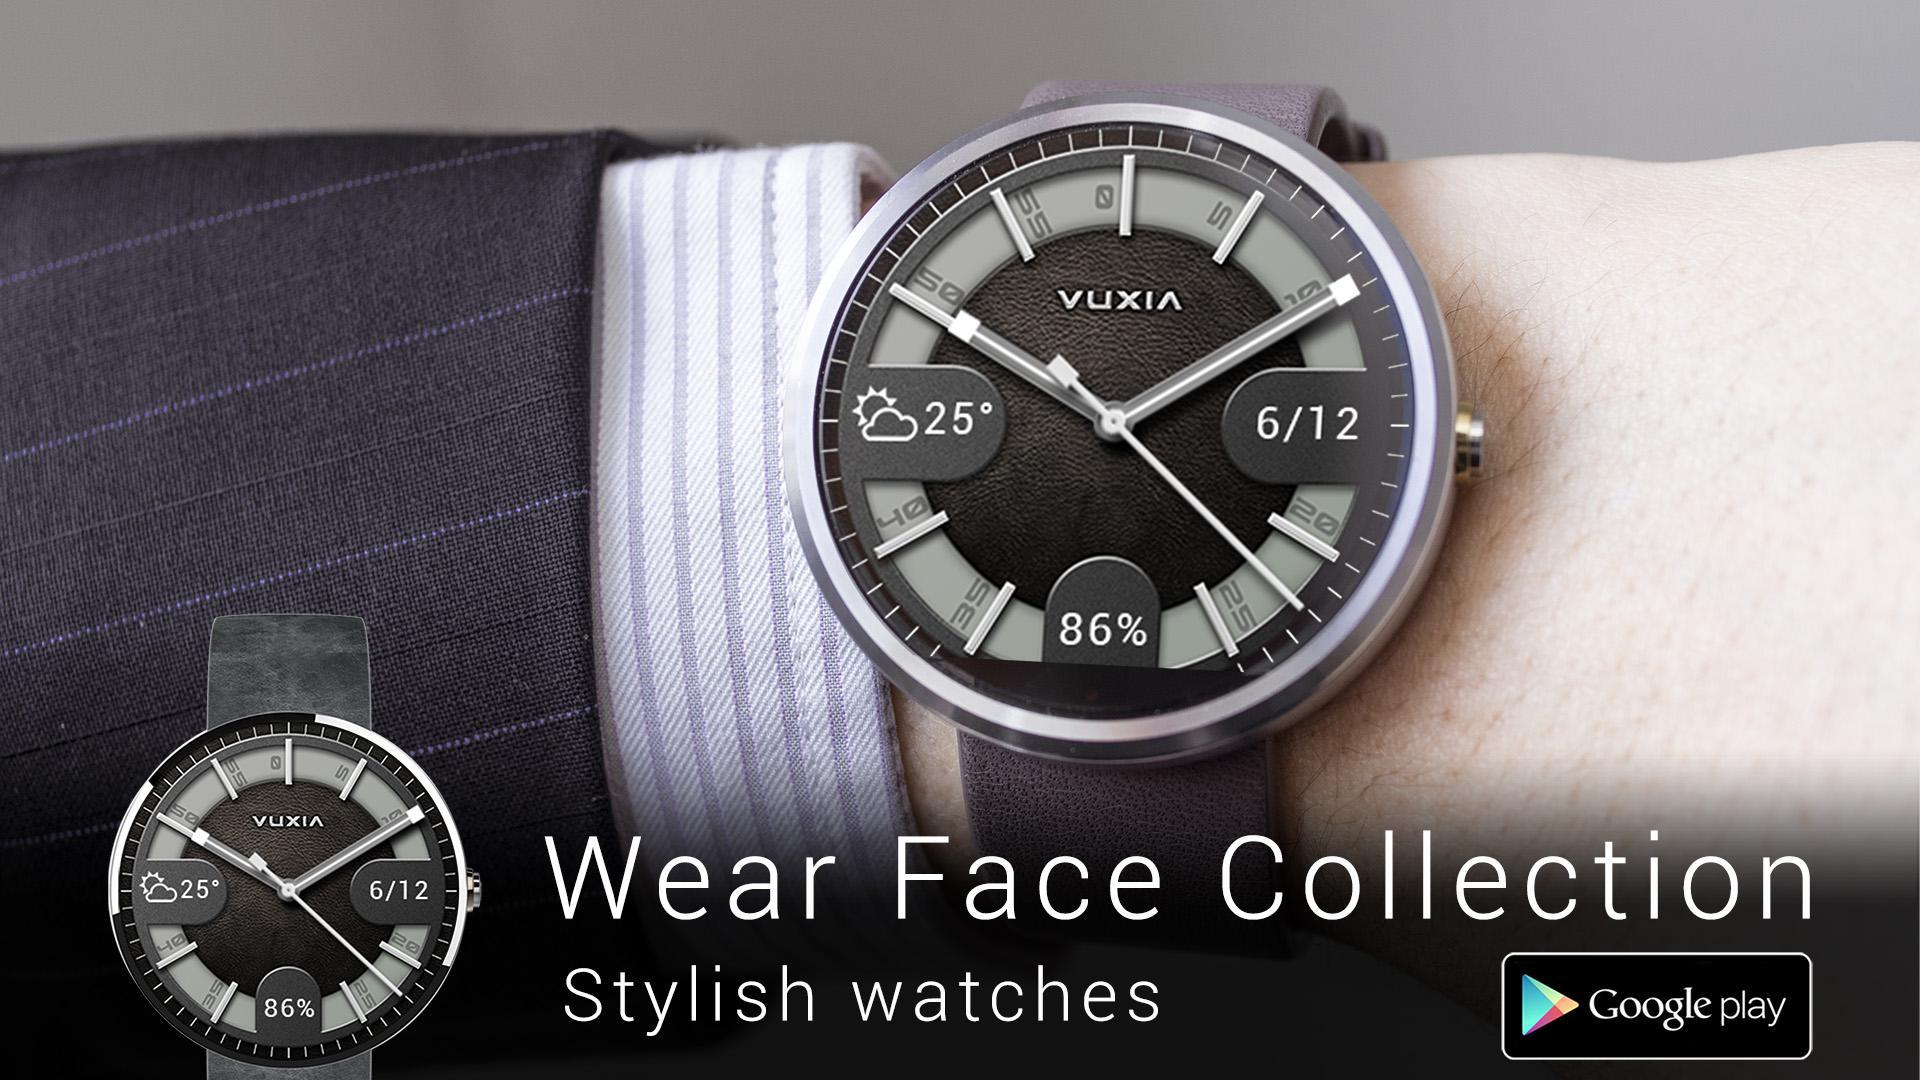 Wear face collection - Wear Face Collection Google Play Store Revenue Download Estimates Us